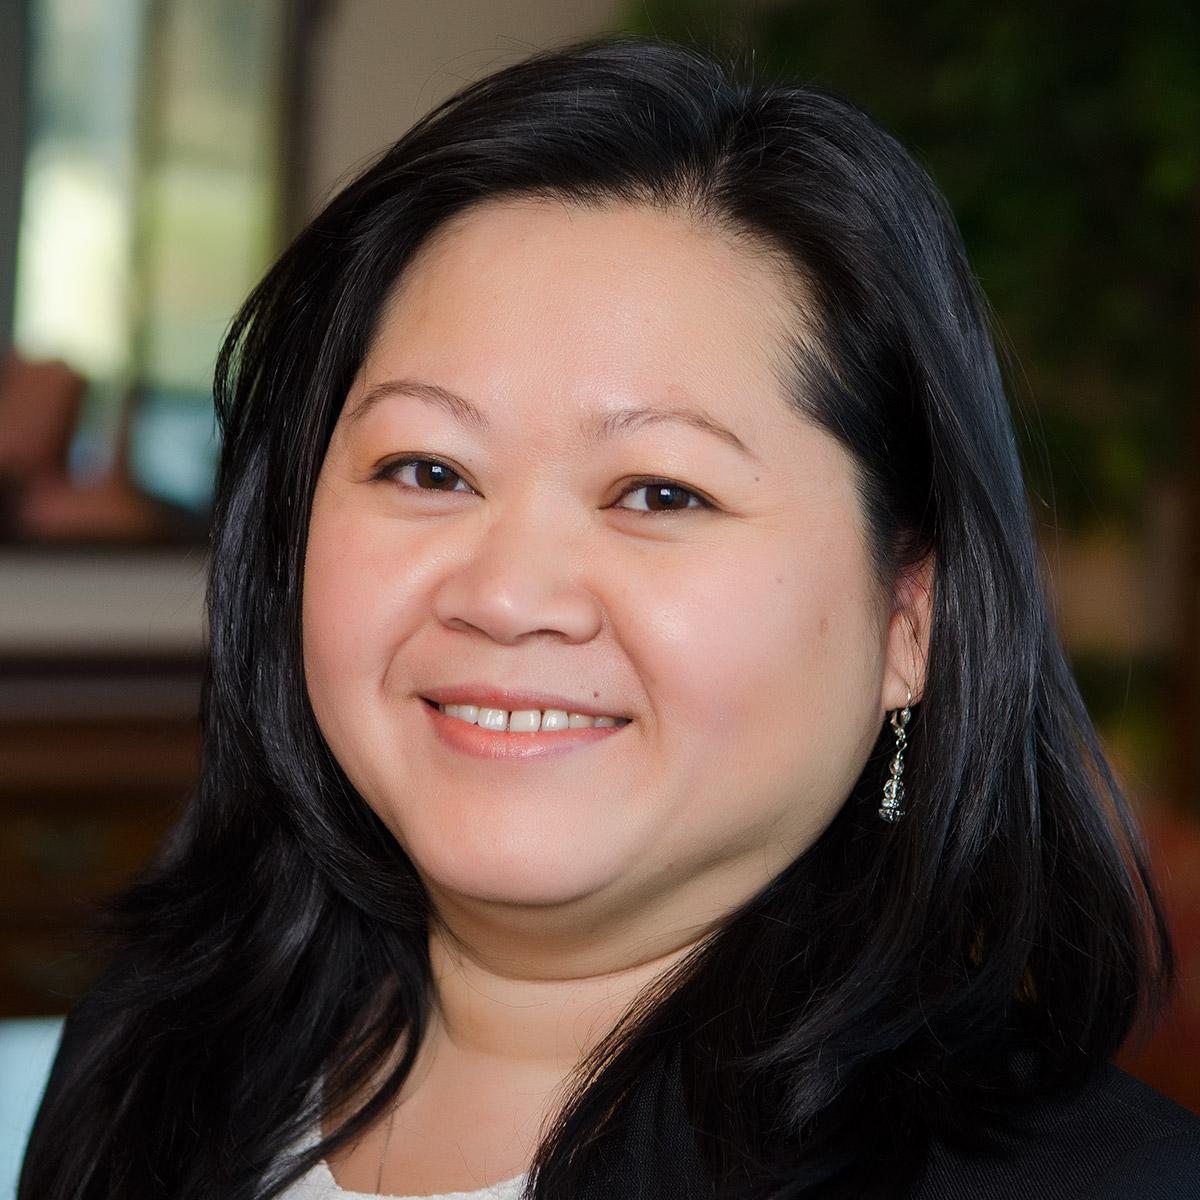 Cathy L. Chamnanphong